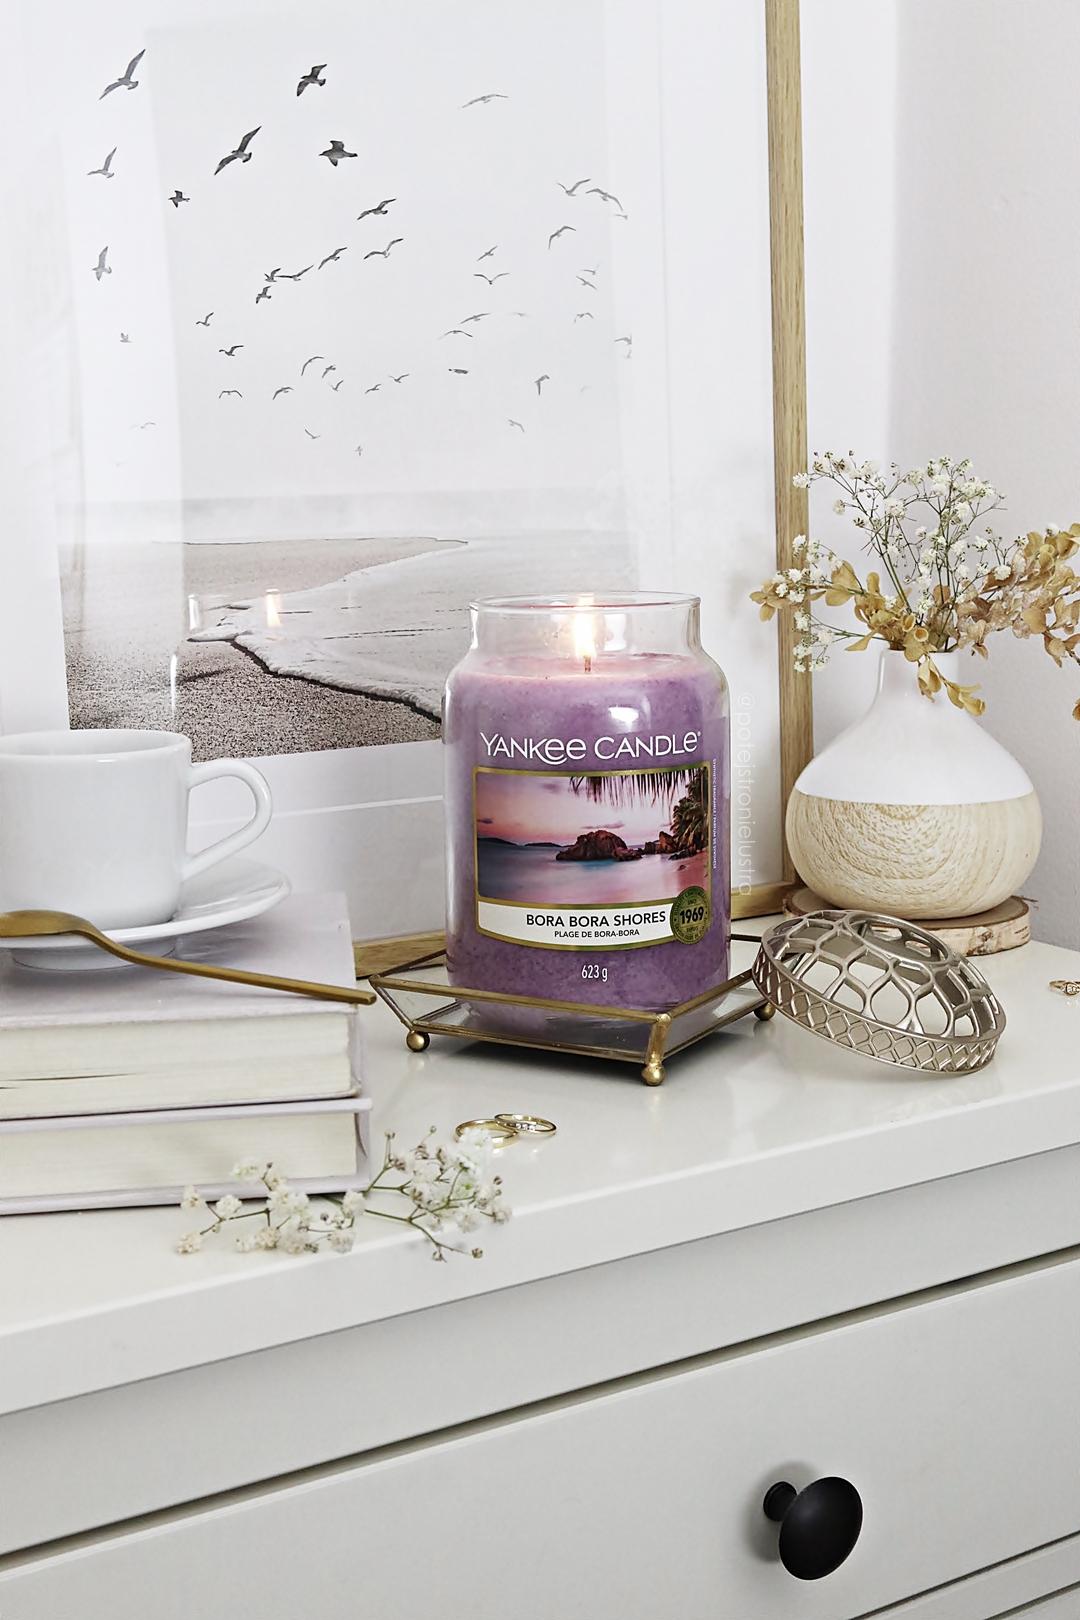 bora bora shores zapach z kolekcji yankee candle wiosna 2021